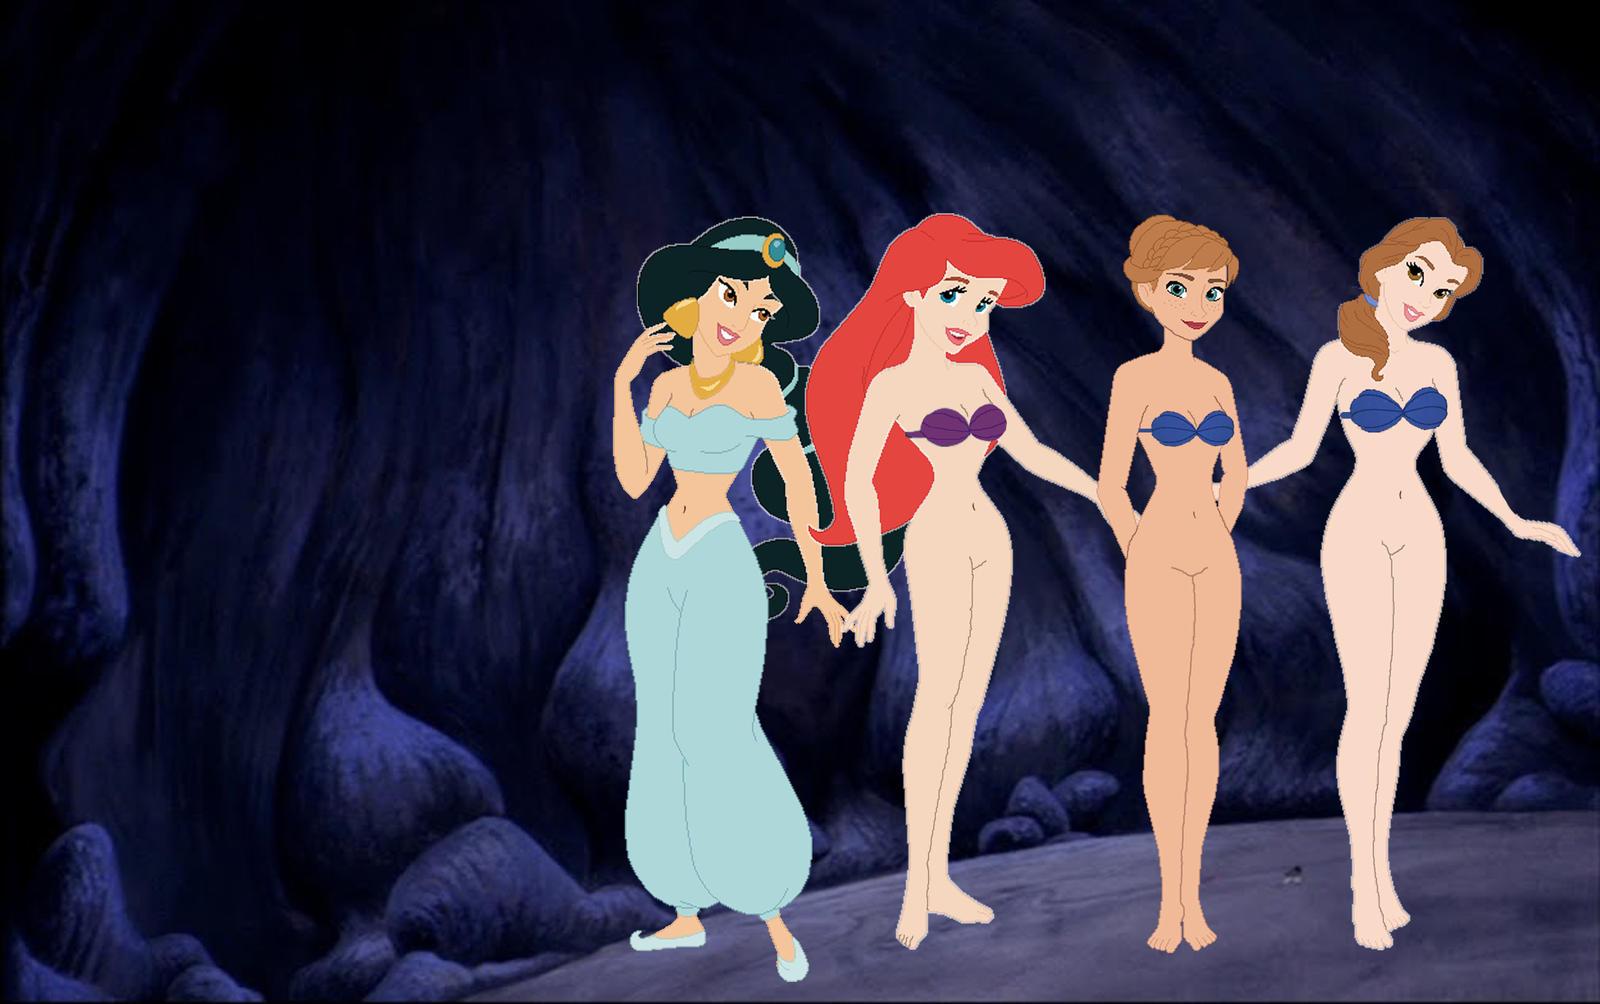 Porn pics of Disney Ariel and Jasmine Page 1